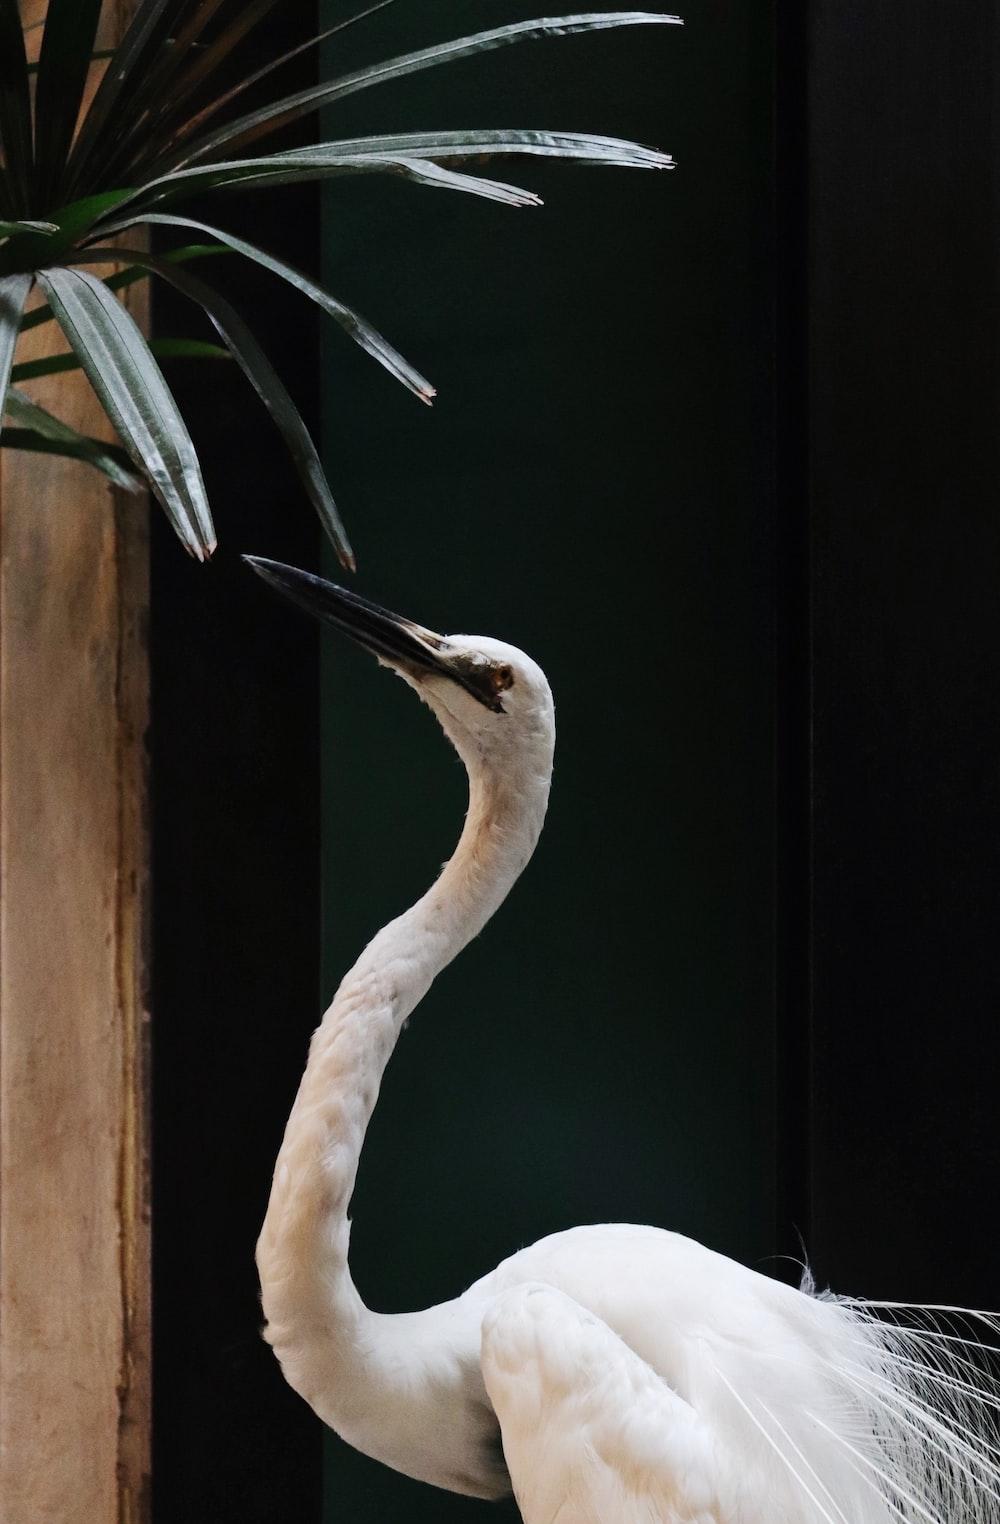 white bird close-up photography